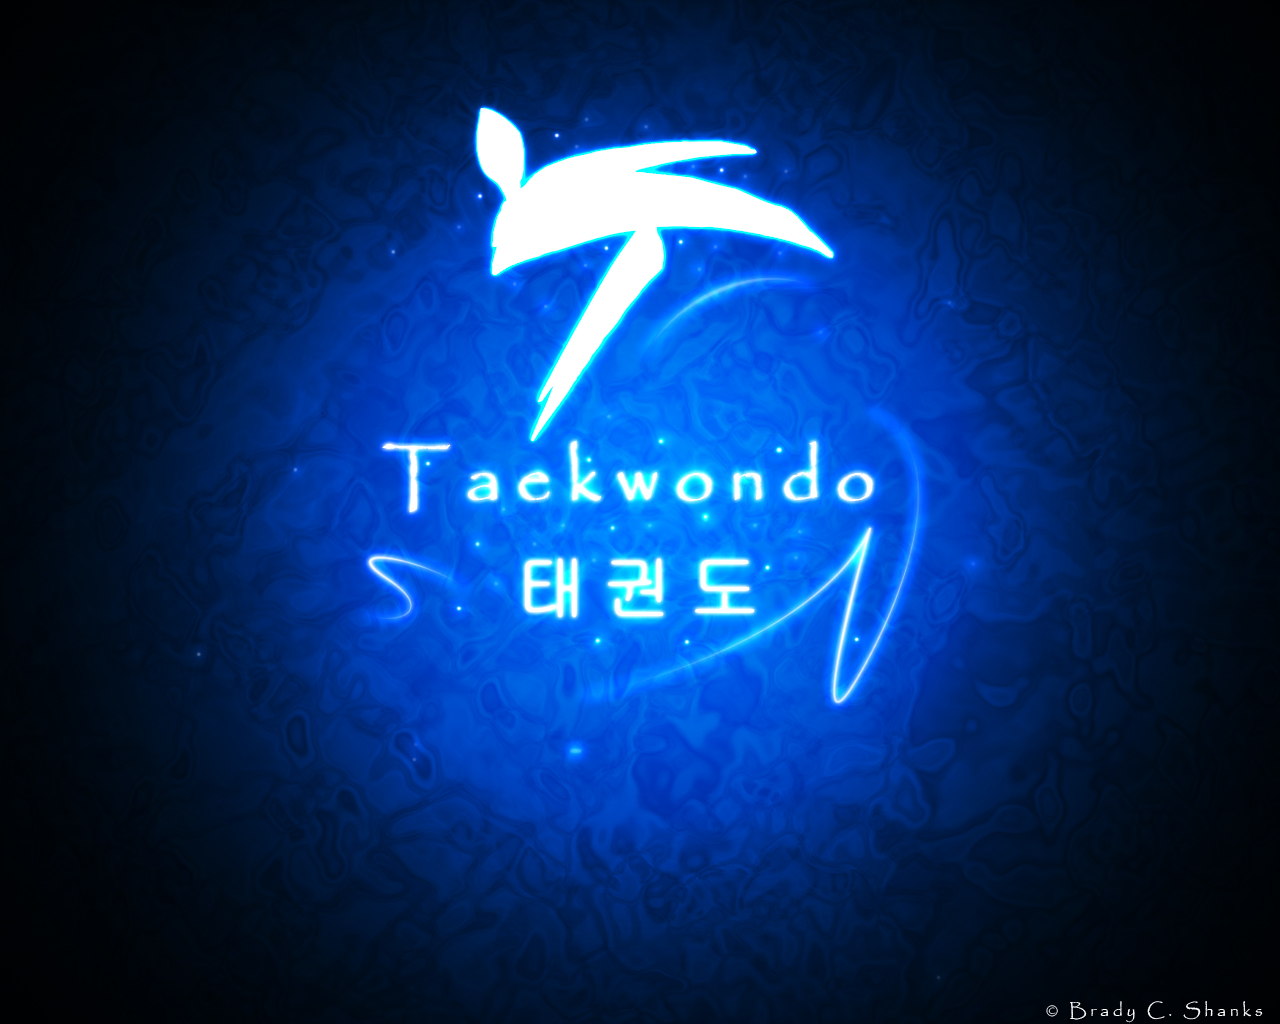 Taekwondo Wallpaper Taekwondo wallpaper taekwondo 1280x1024